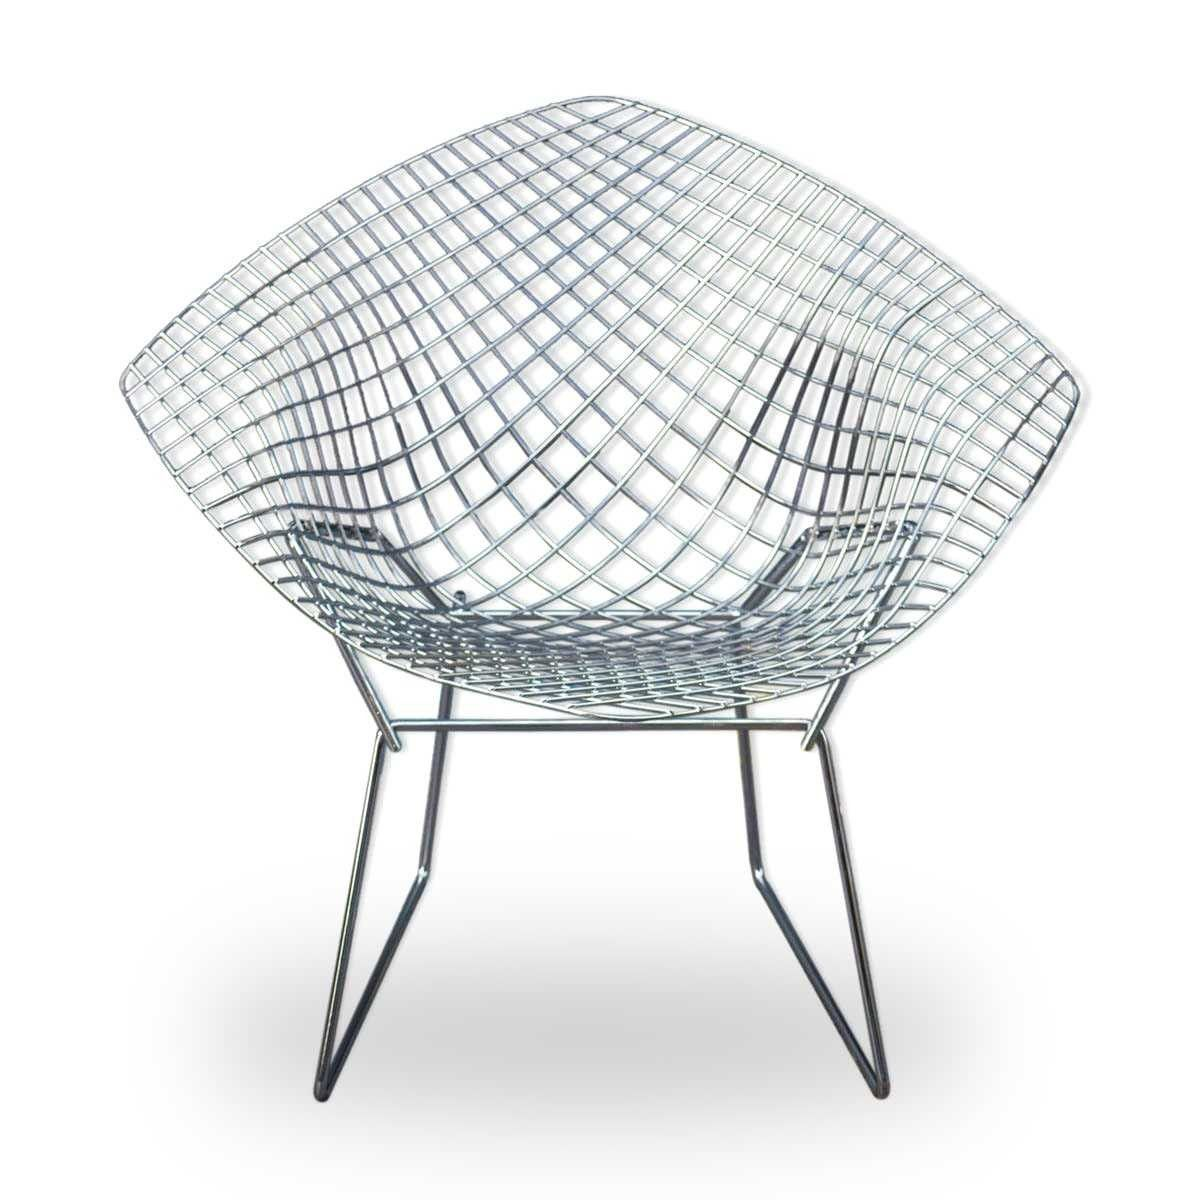 Fauteuil Diamond De Harry Bertoia Pour Knoll 2000 Design Market Harry Bertoia Chaise Moderne Fauteuil